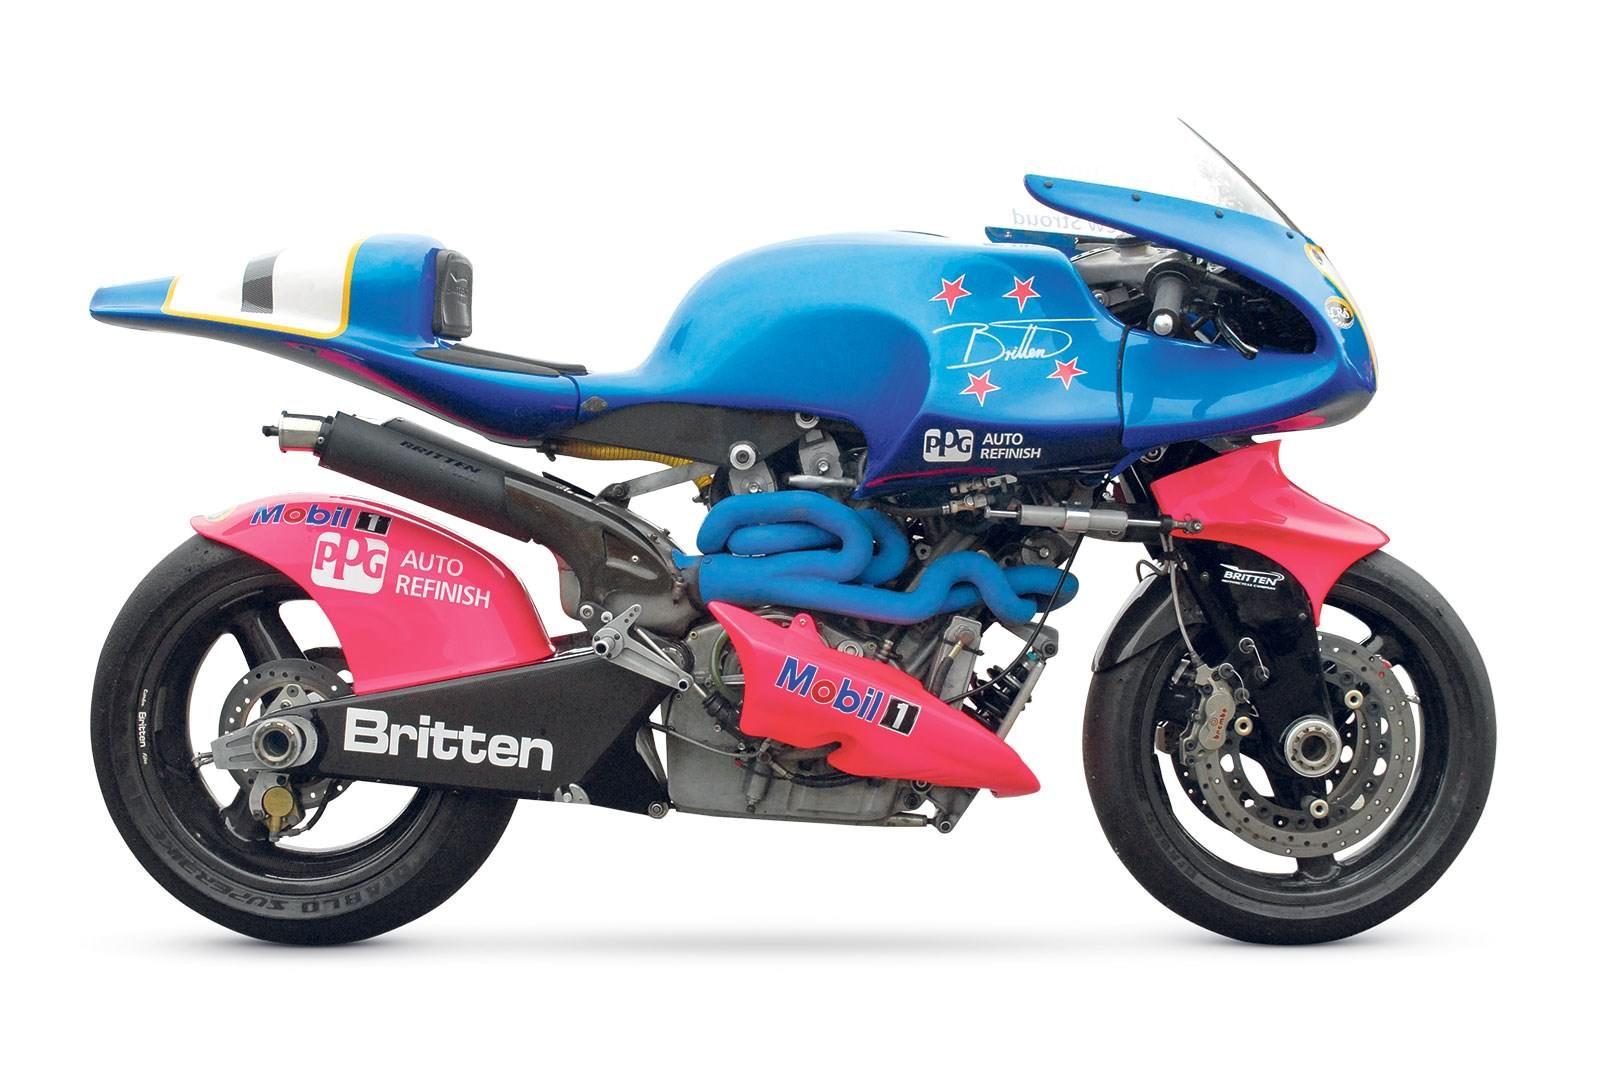 Britten Return To The Island Unique Bikes Motorbike Racing Motorcycles Motorbikes